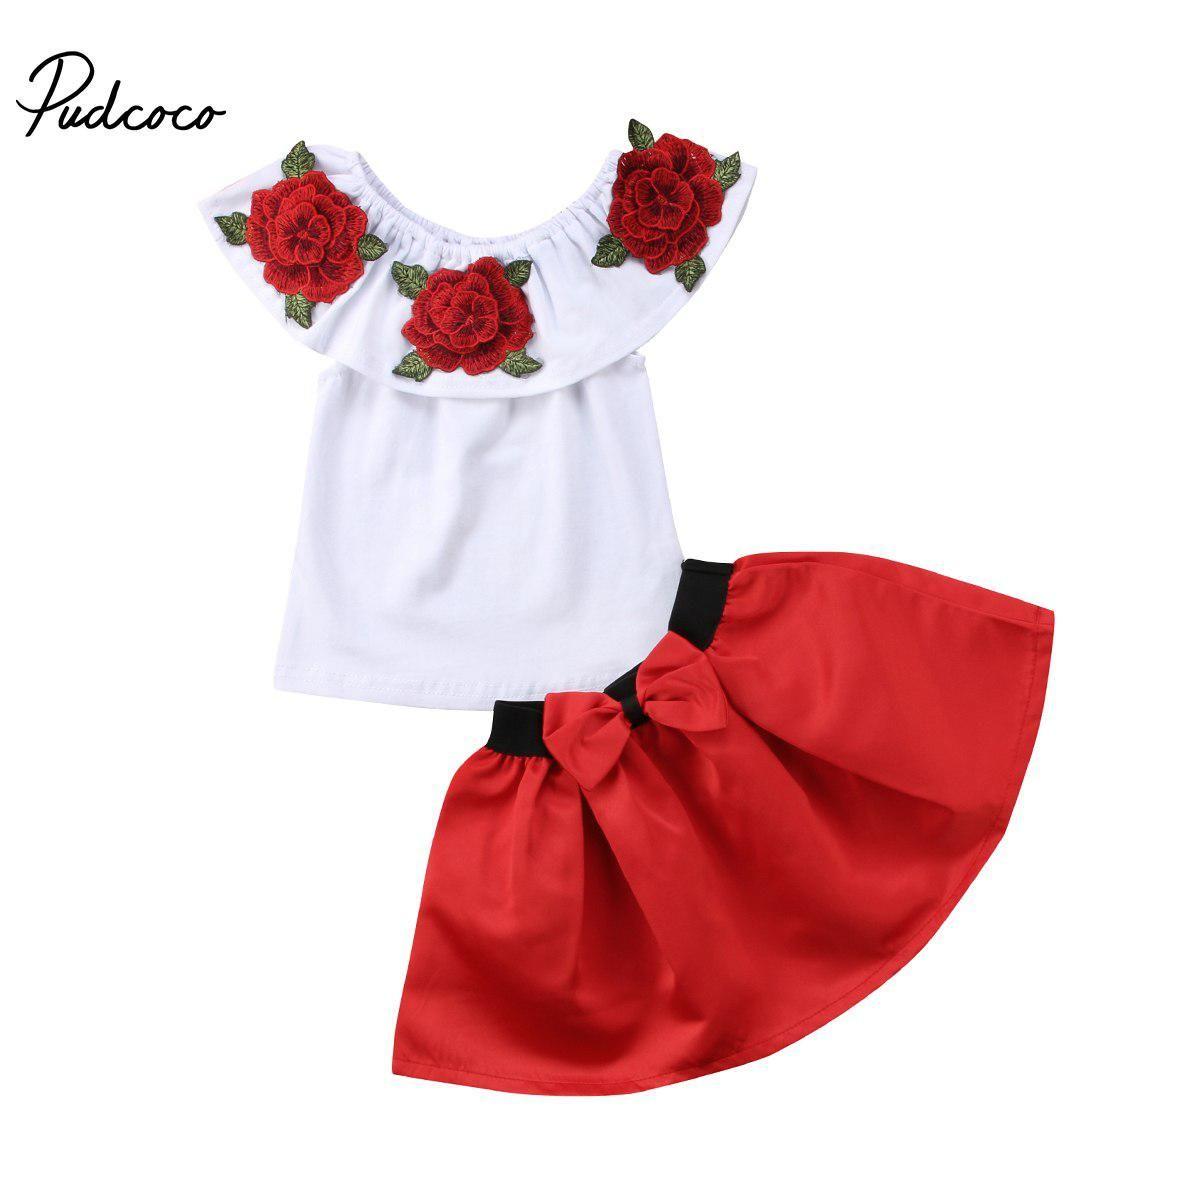 c94cb311c00bbd Kids Toddler Girl Summer Clothing Set Flower Off Shoulder Tops T-Shirt Bow  Tutu Skirt